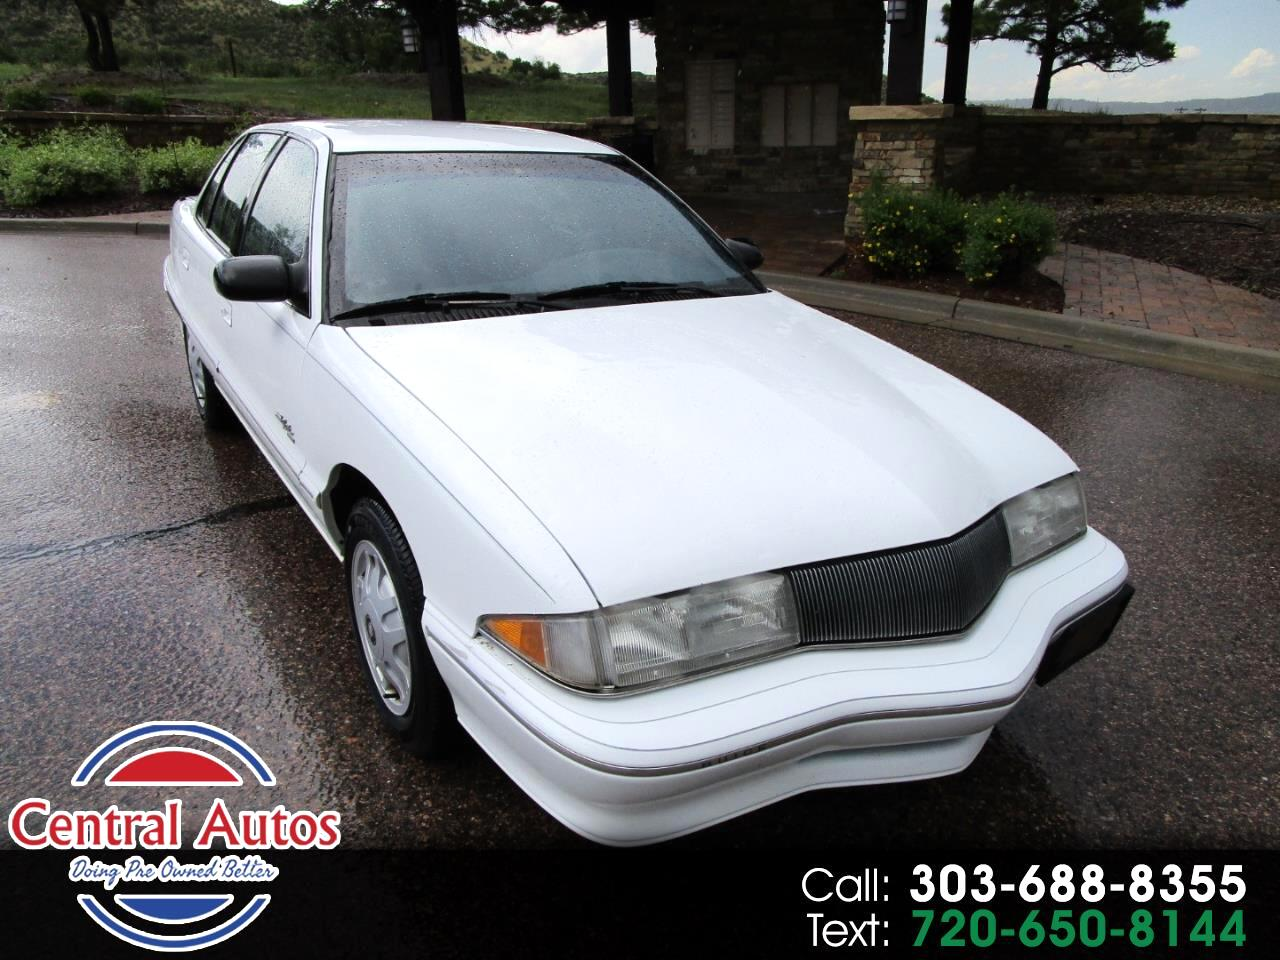 1994 Buick Skylark 4dr Sedan Custom